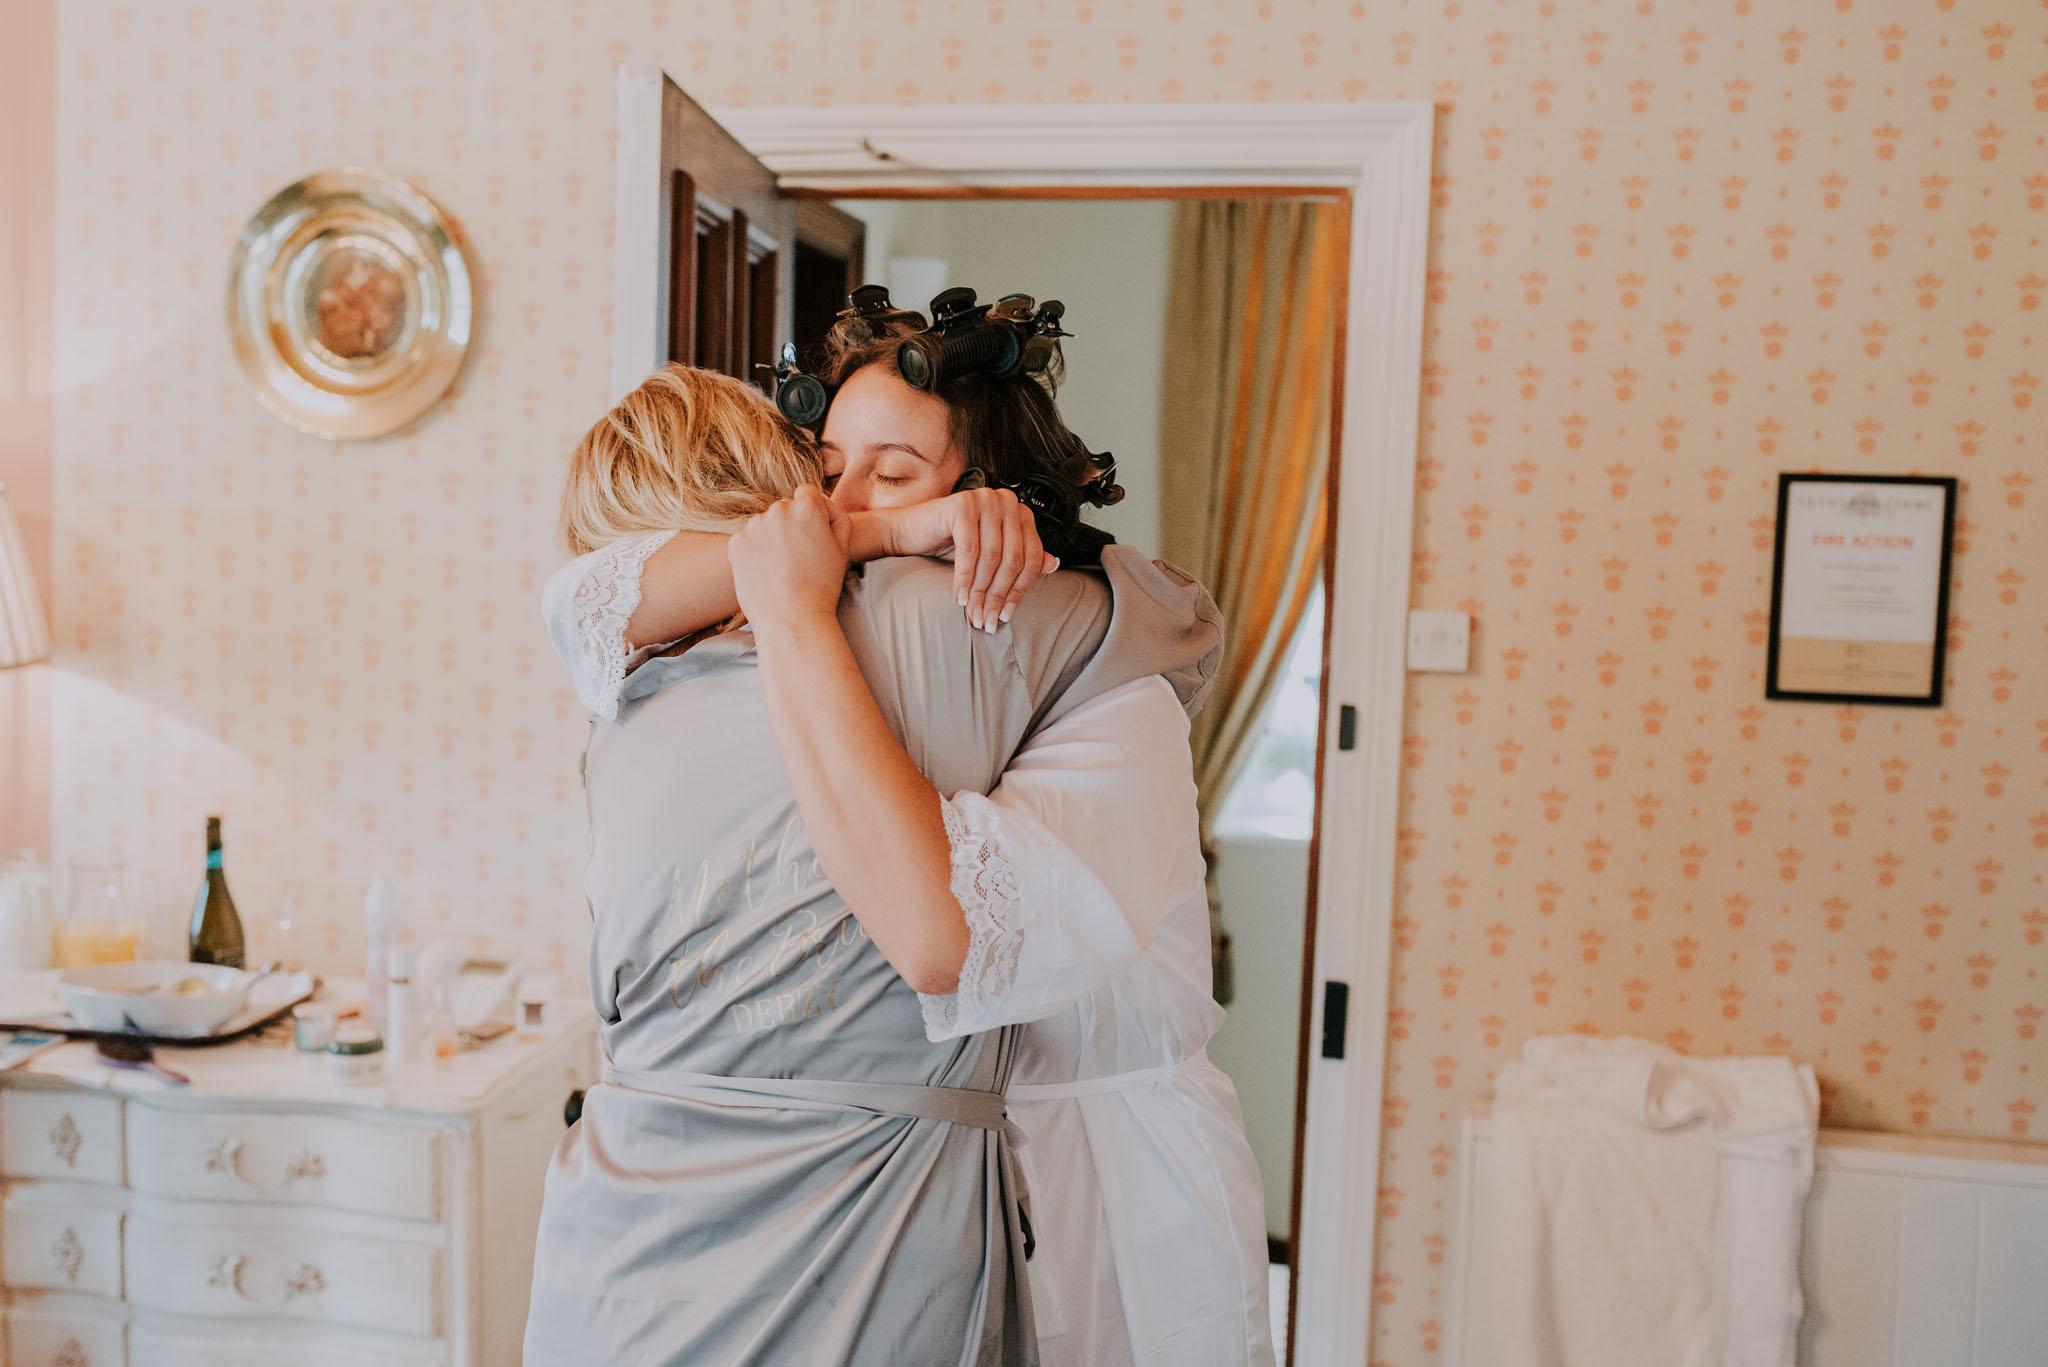 wedding-photographer-glewstone-court-hereford-scott-stockwell-photography034.jpg